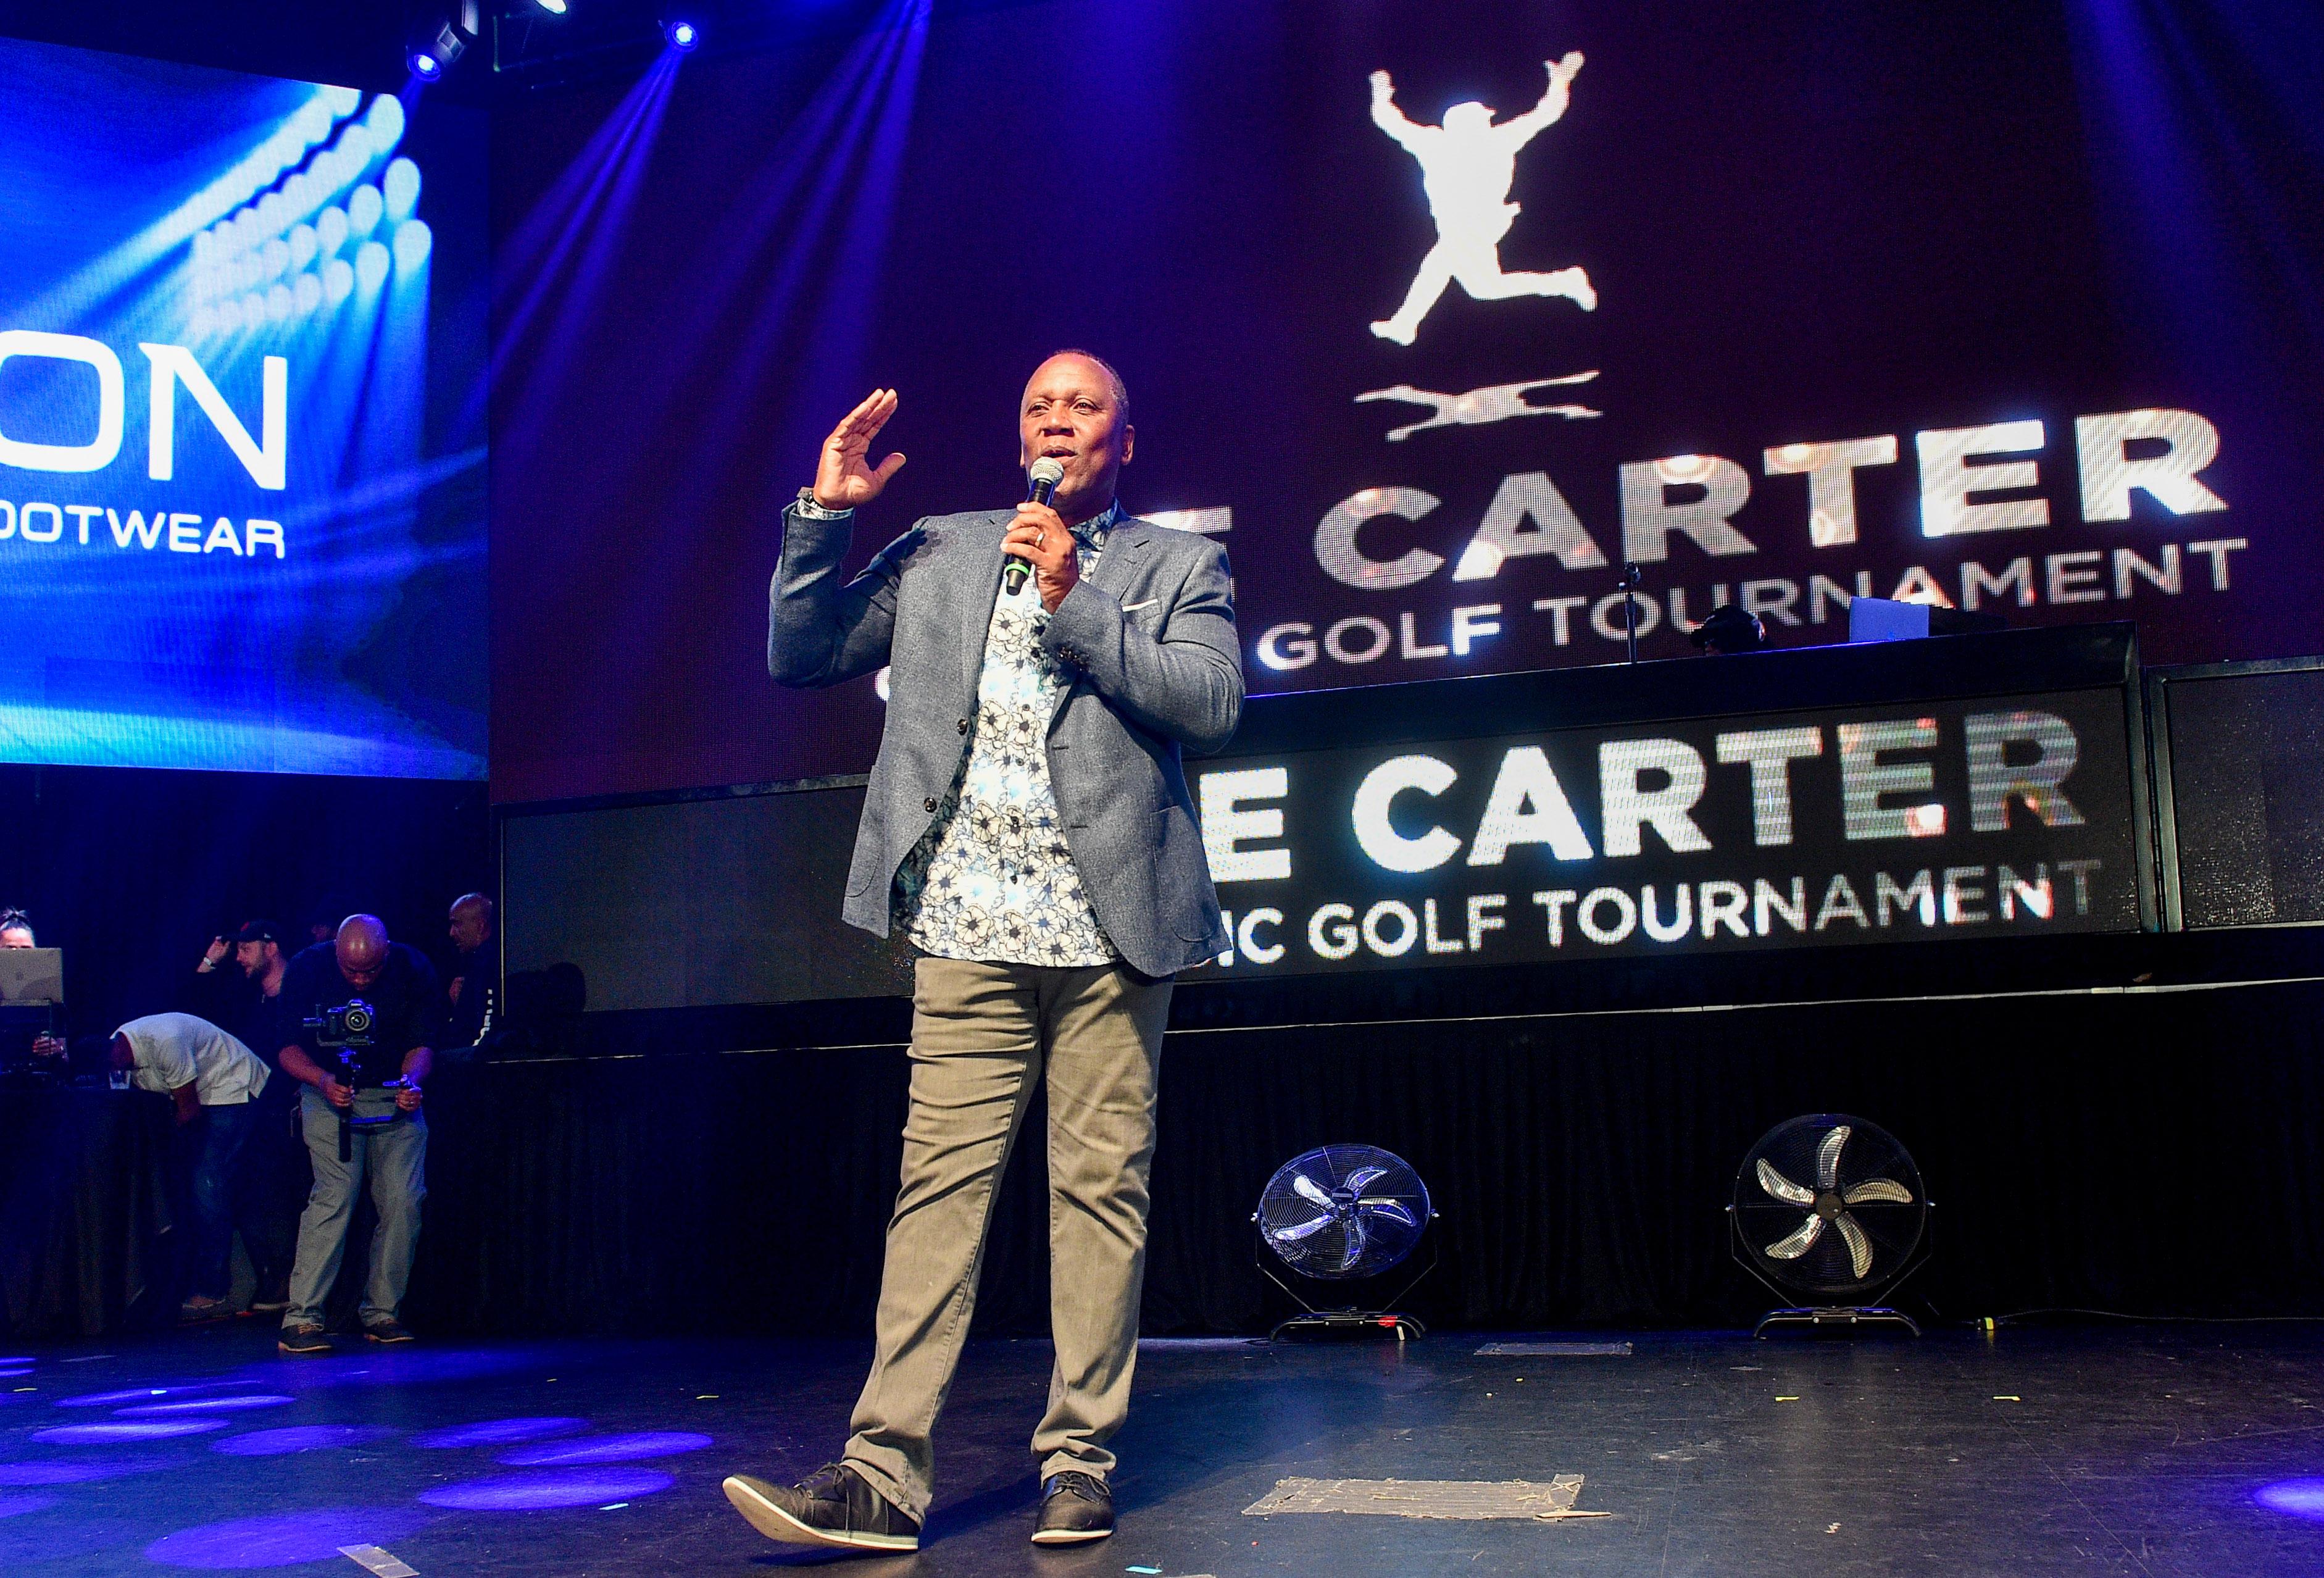 Joe-Carter1